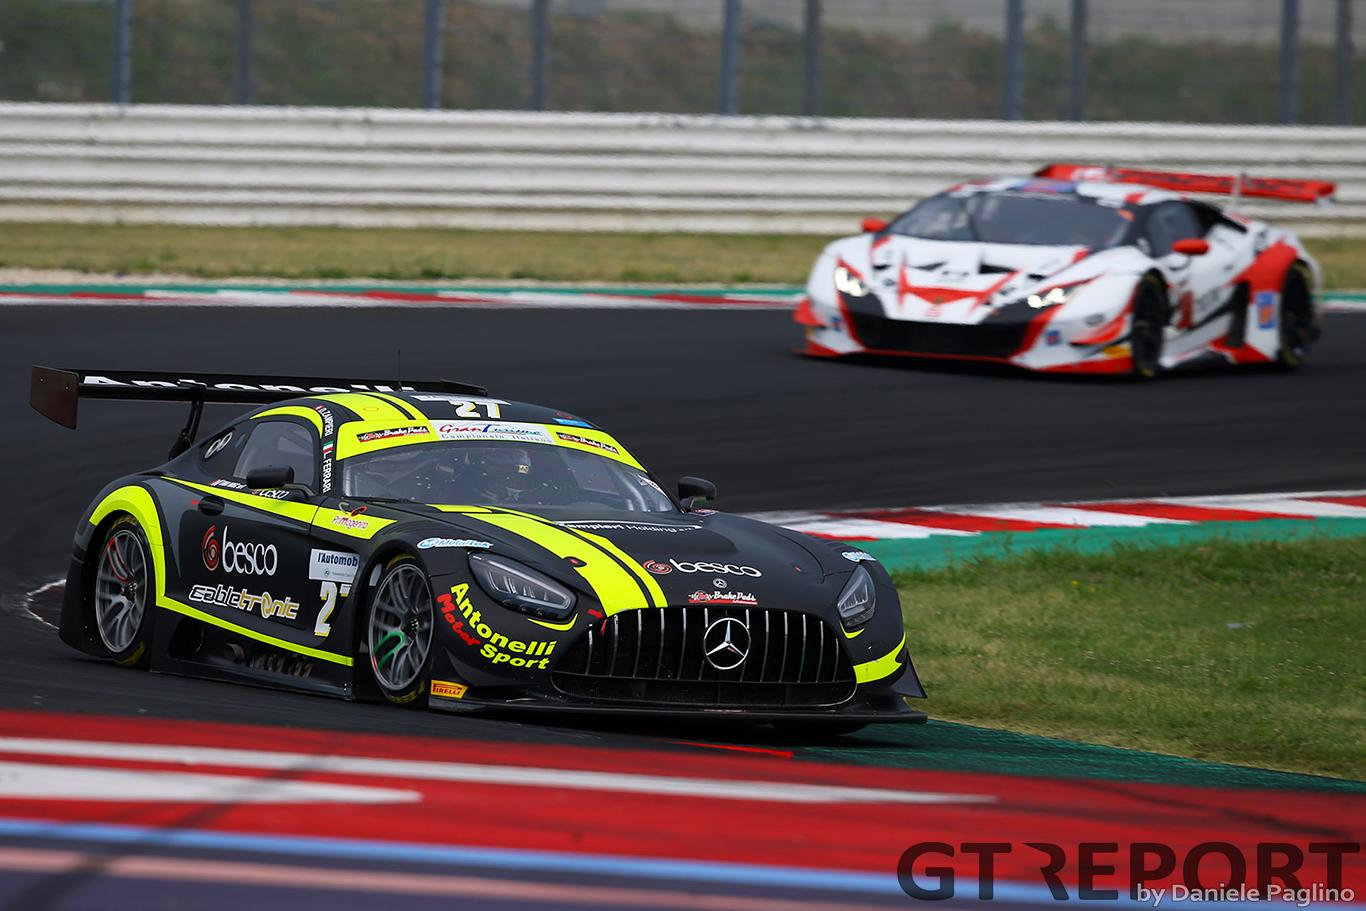 AKM Motorsport By Antonelli to race in Italian GT Sprint Series with Baruch, Segù